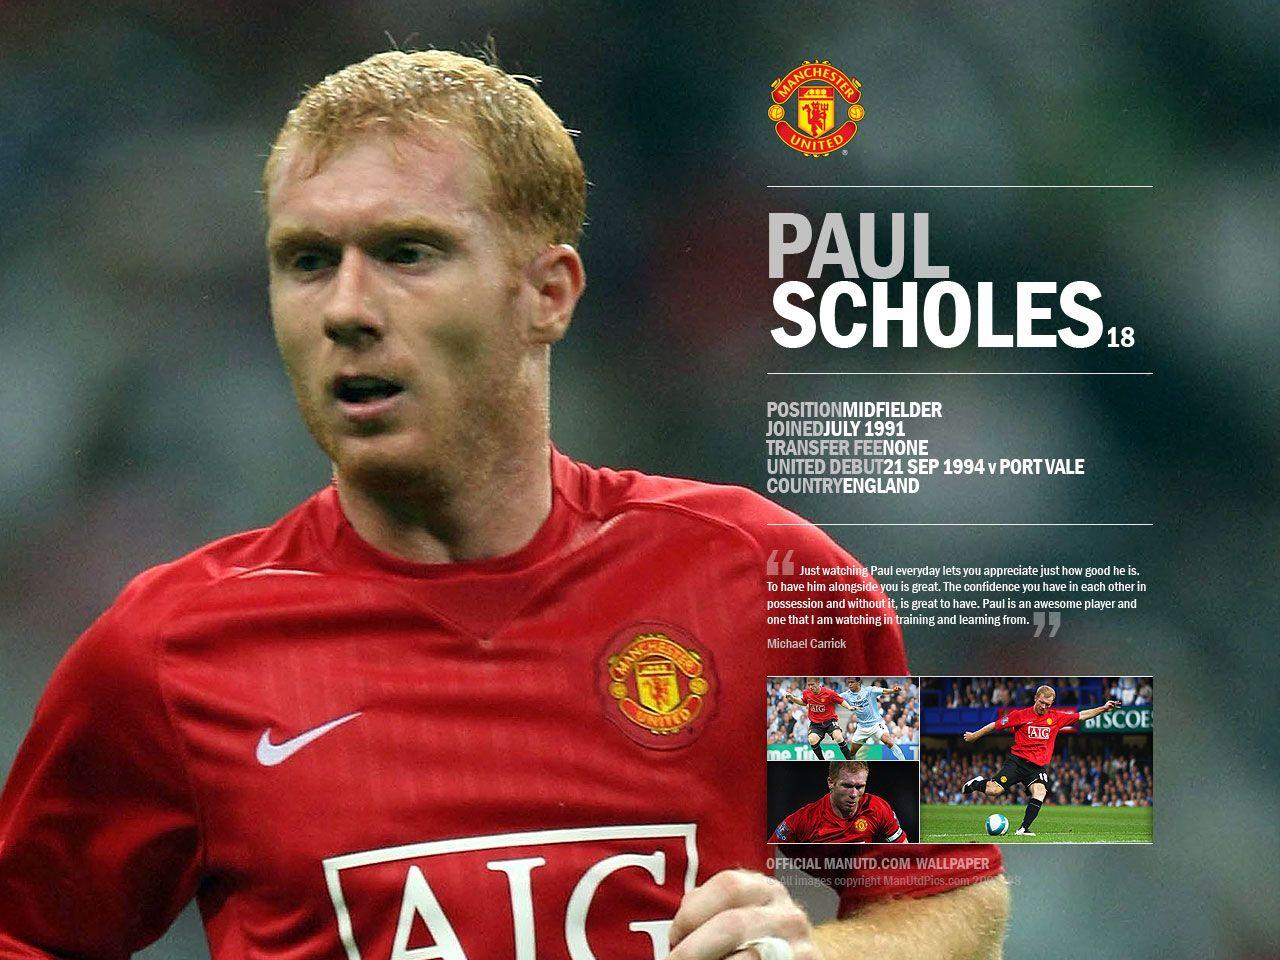 PLN Blog Spot Man United Paul Scholes Set To Make 500 Marking